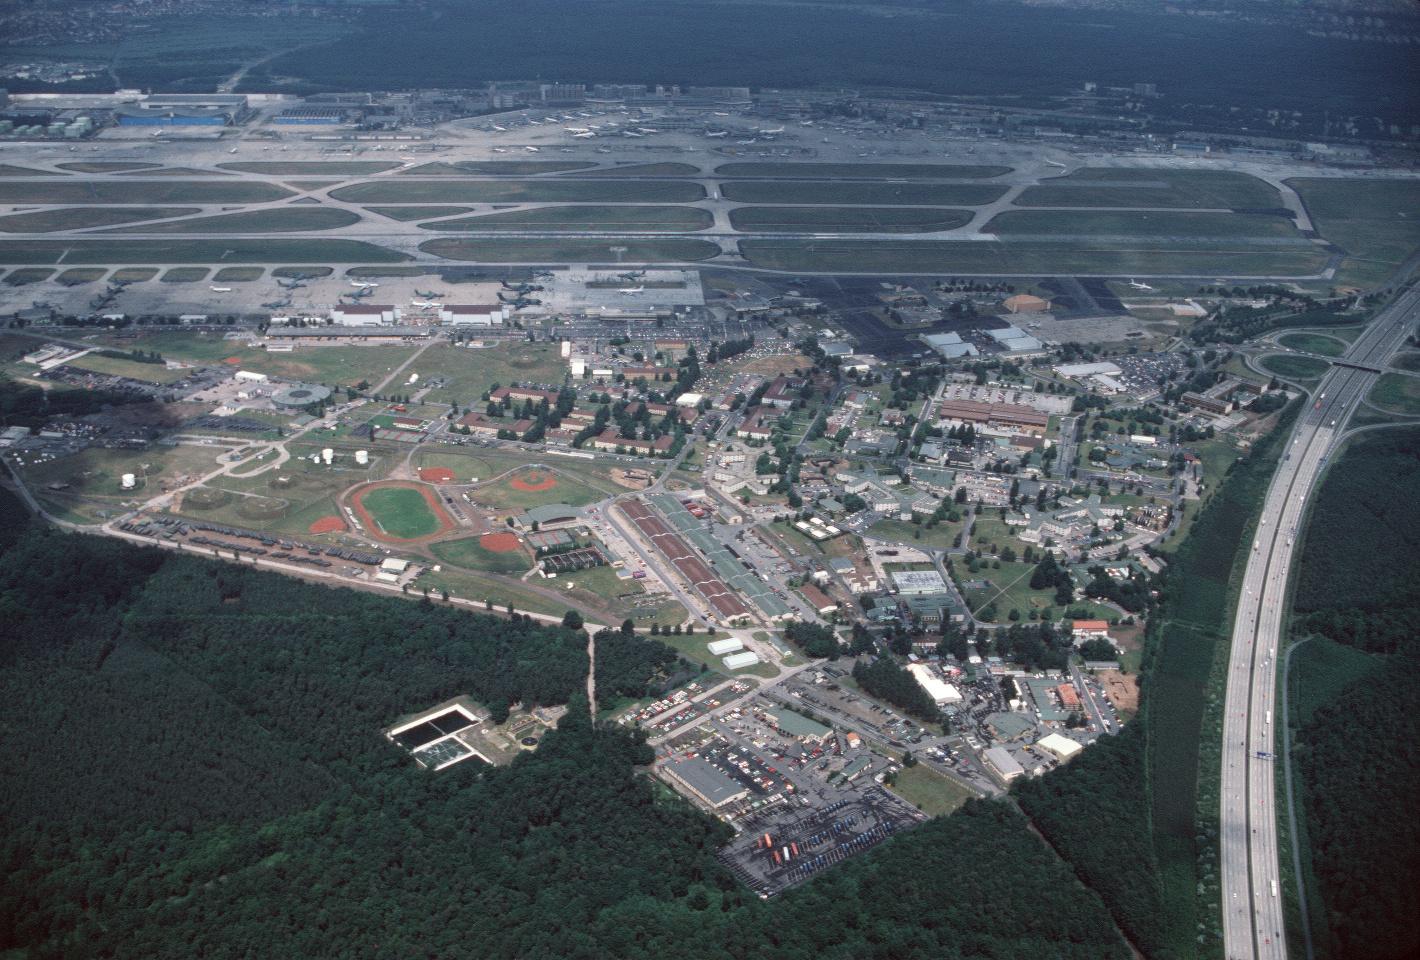 Aerial view Frankfurt Rhein/Main Air Base, Germany